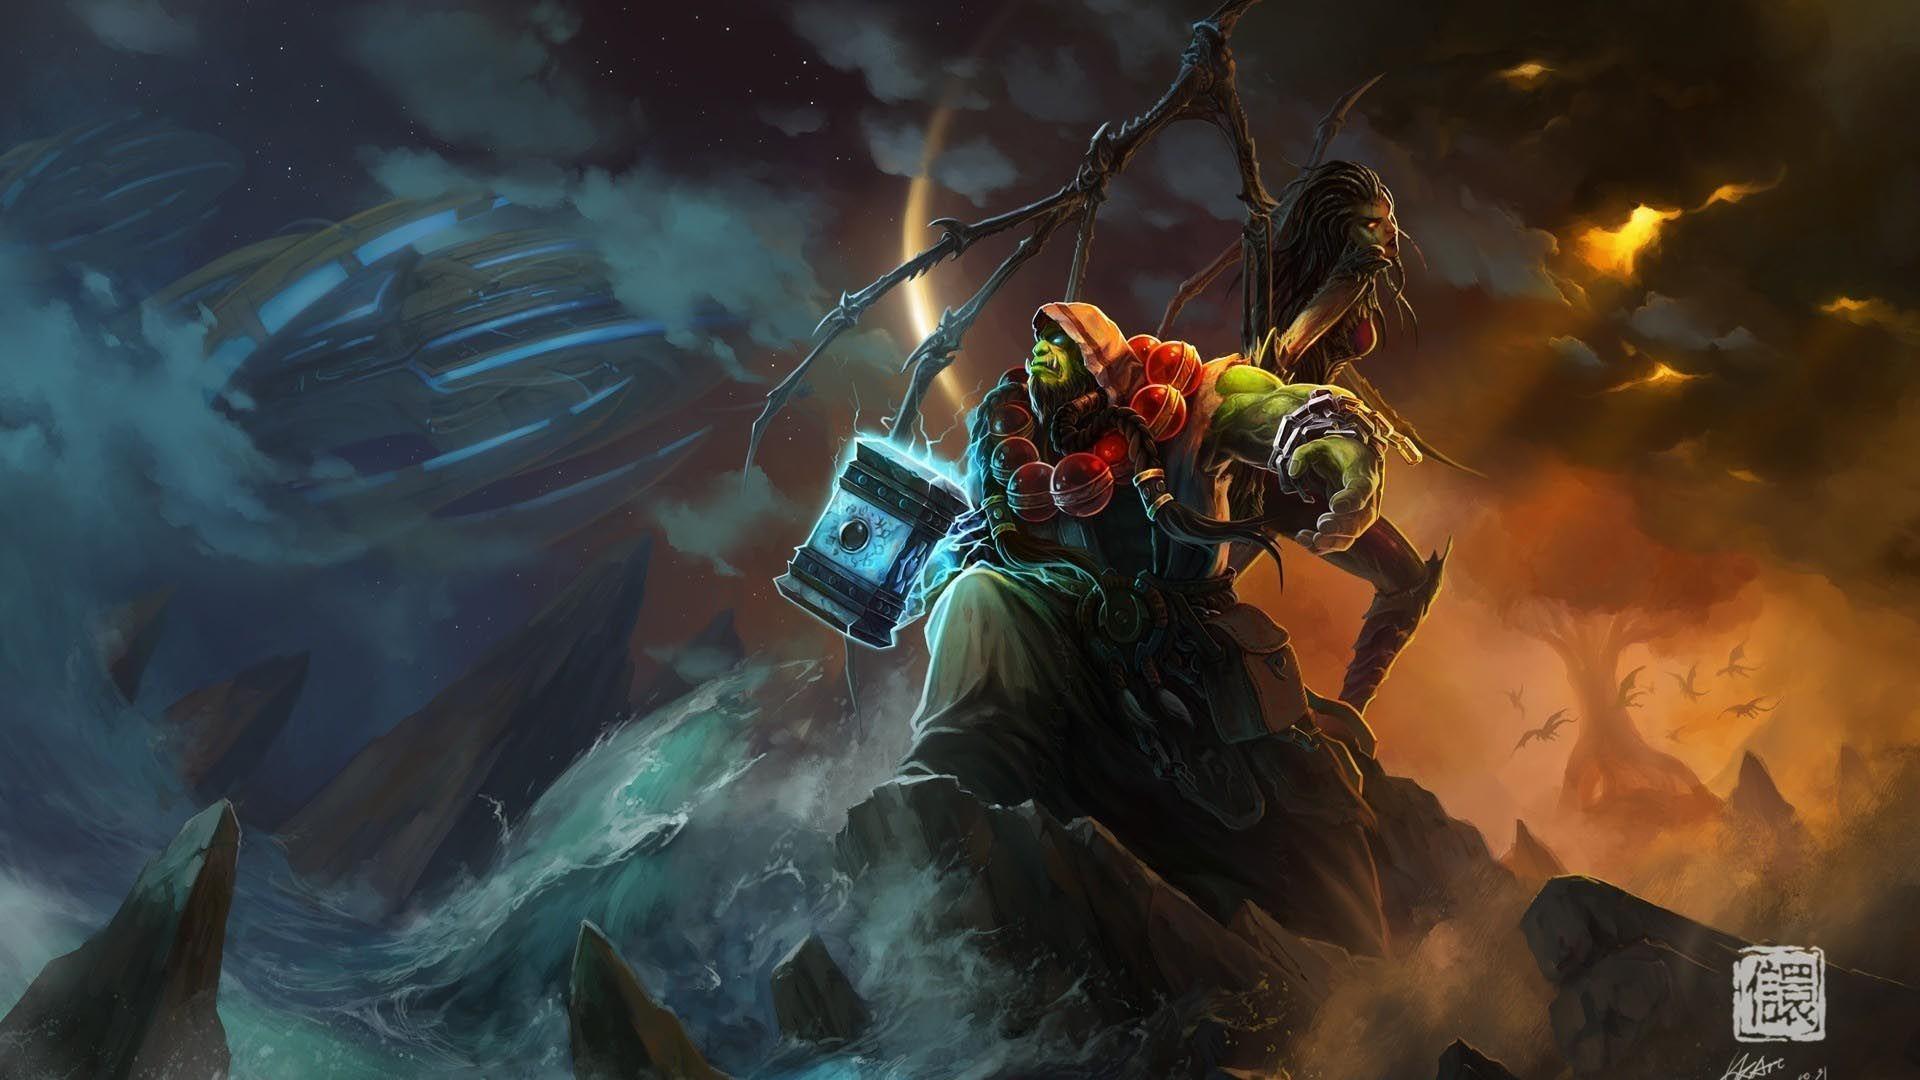 Alliance Symbol World of Warcraft HD Wallpaper - bloodvein.net